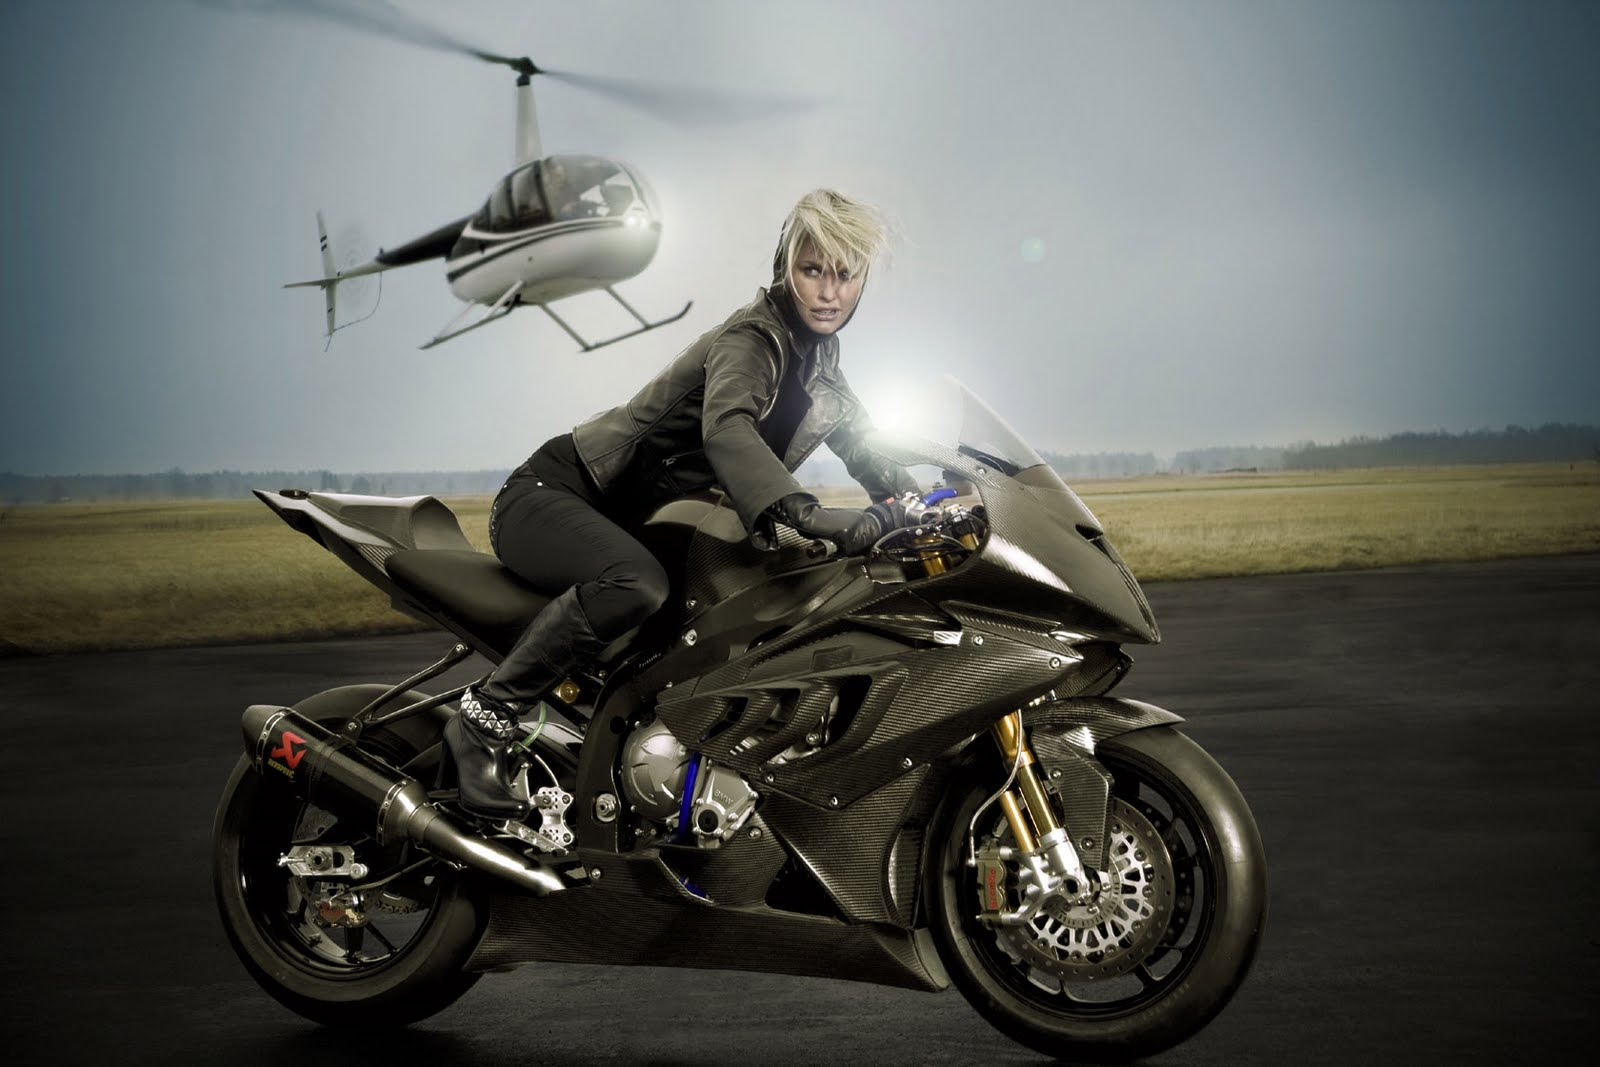 Bmw S1000rr Girl Wallpaper Fast Bikes Online Bmw S1000rr Black